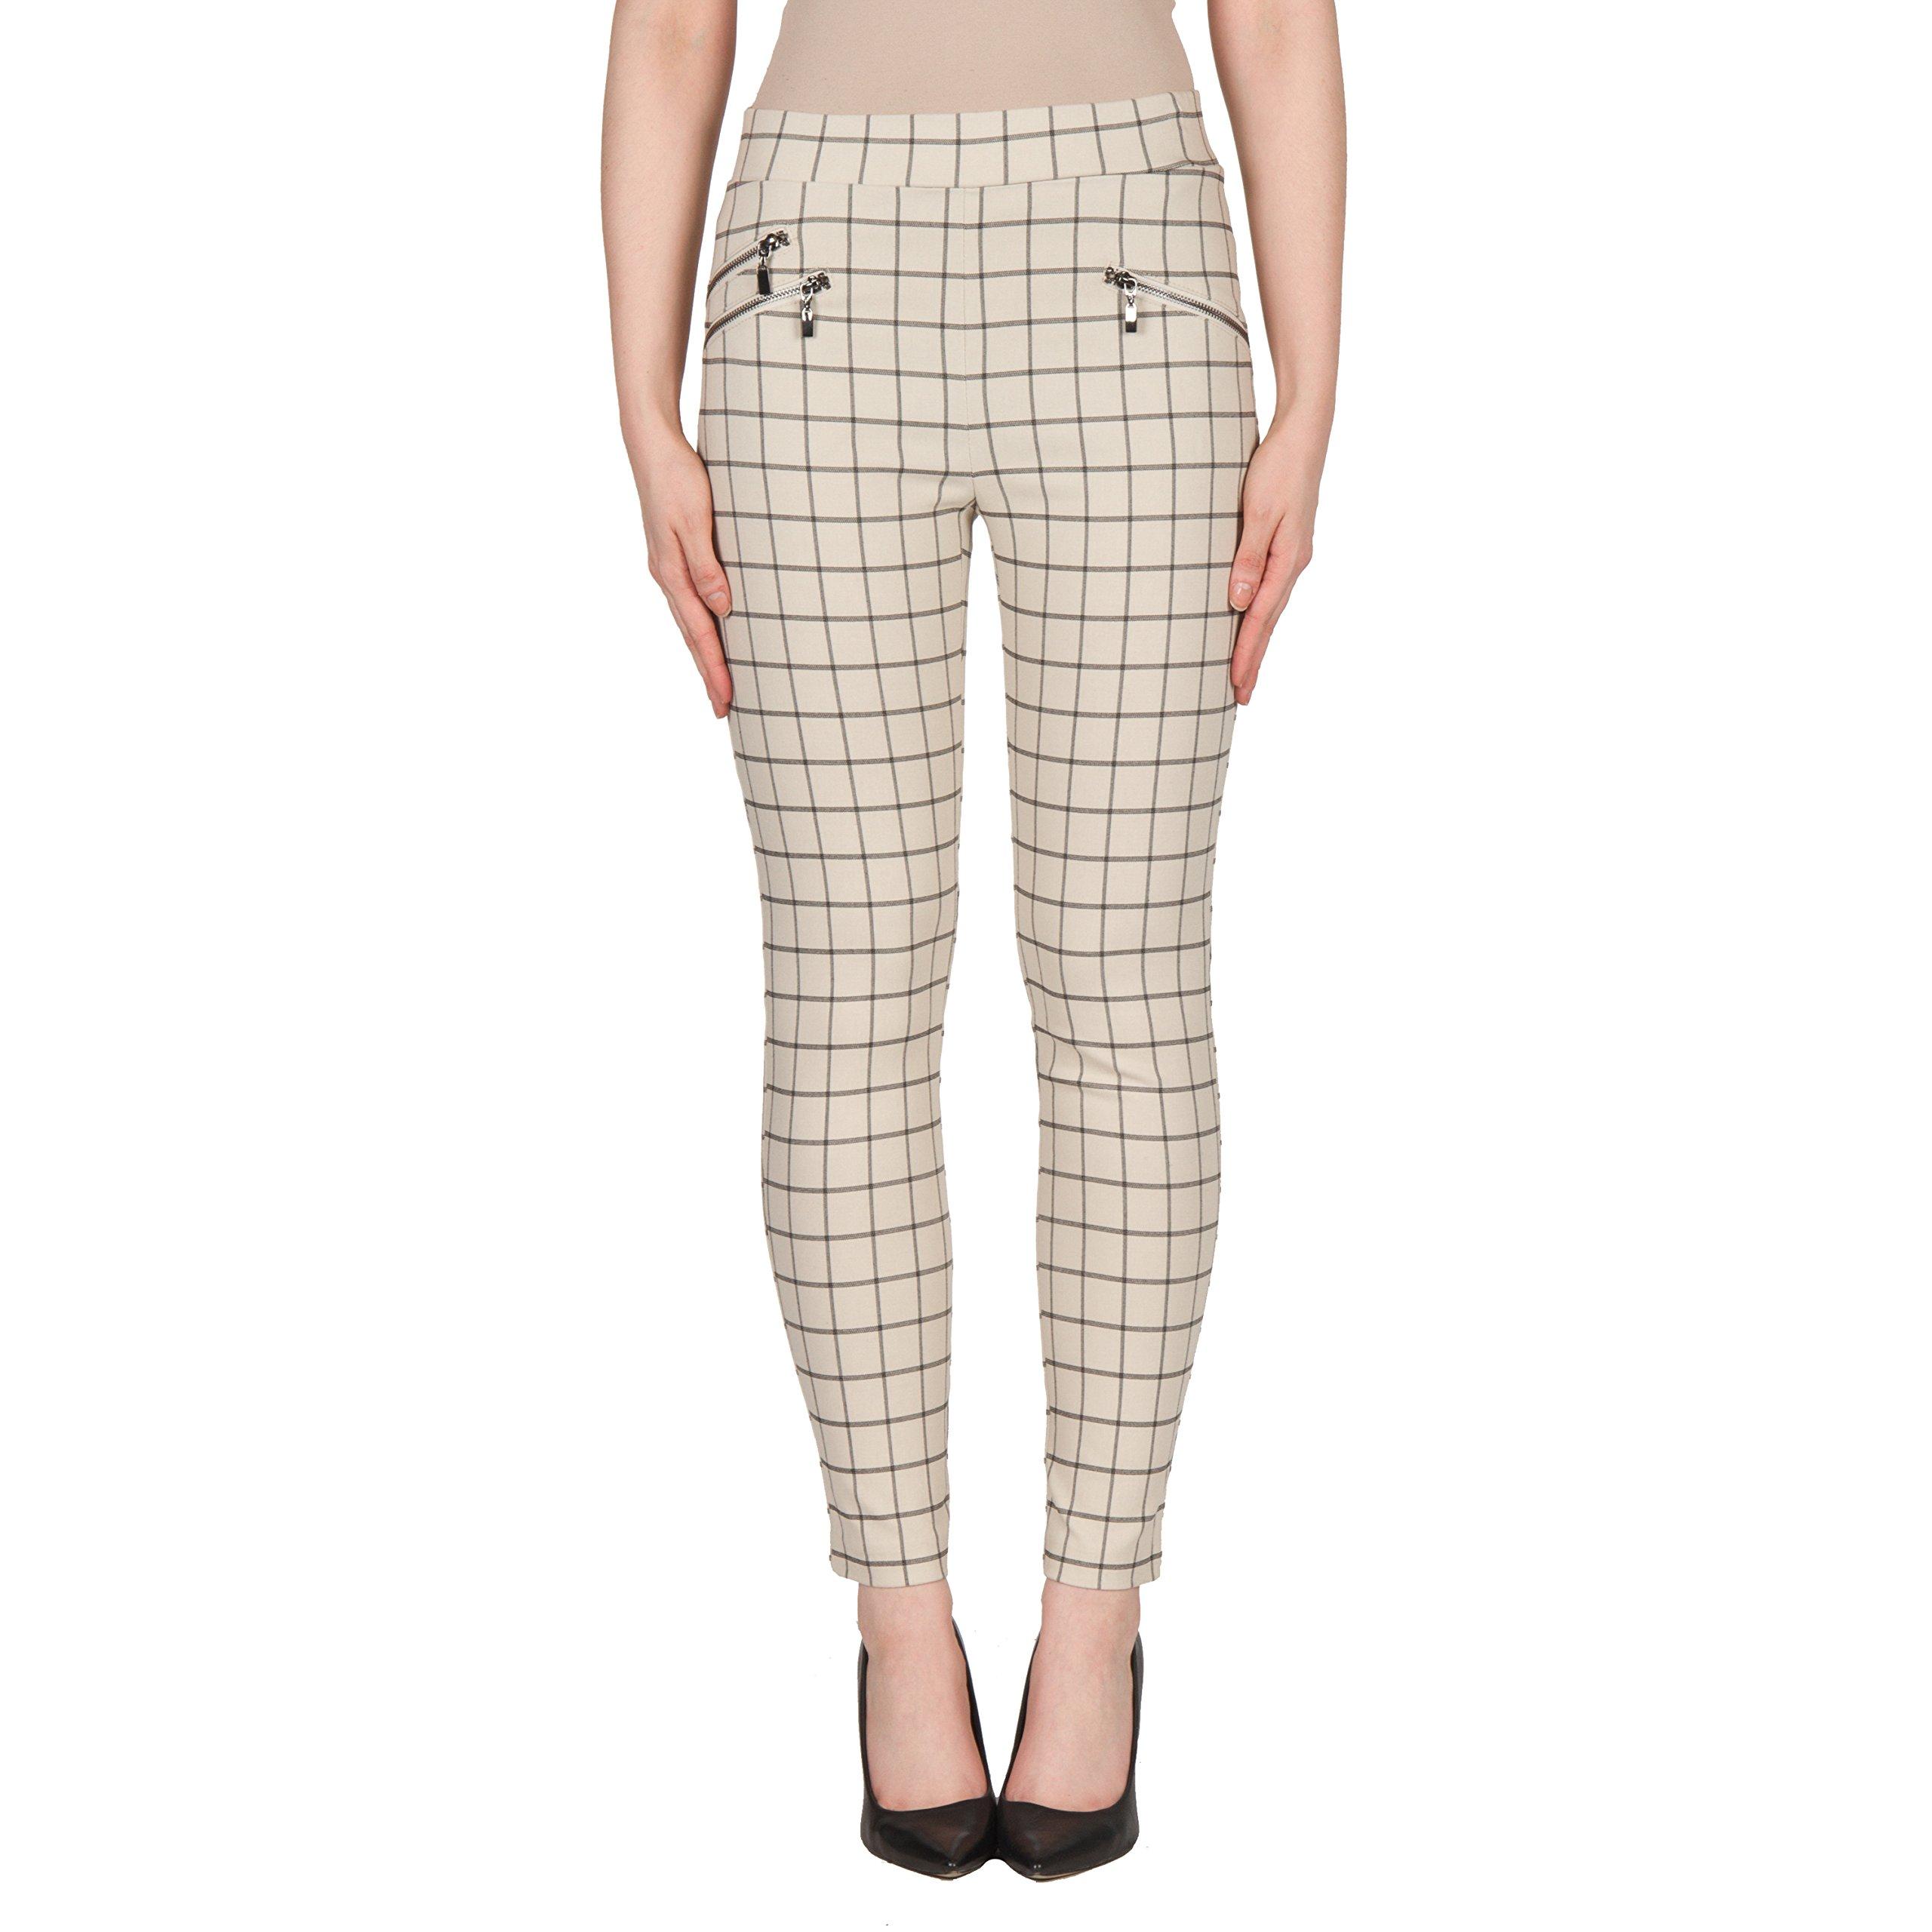 Joseph Ribkoff Stretch Twill Checkered Pant - Style 173776 - Size 8 by Joseph Ribkoff